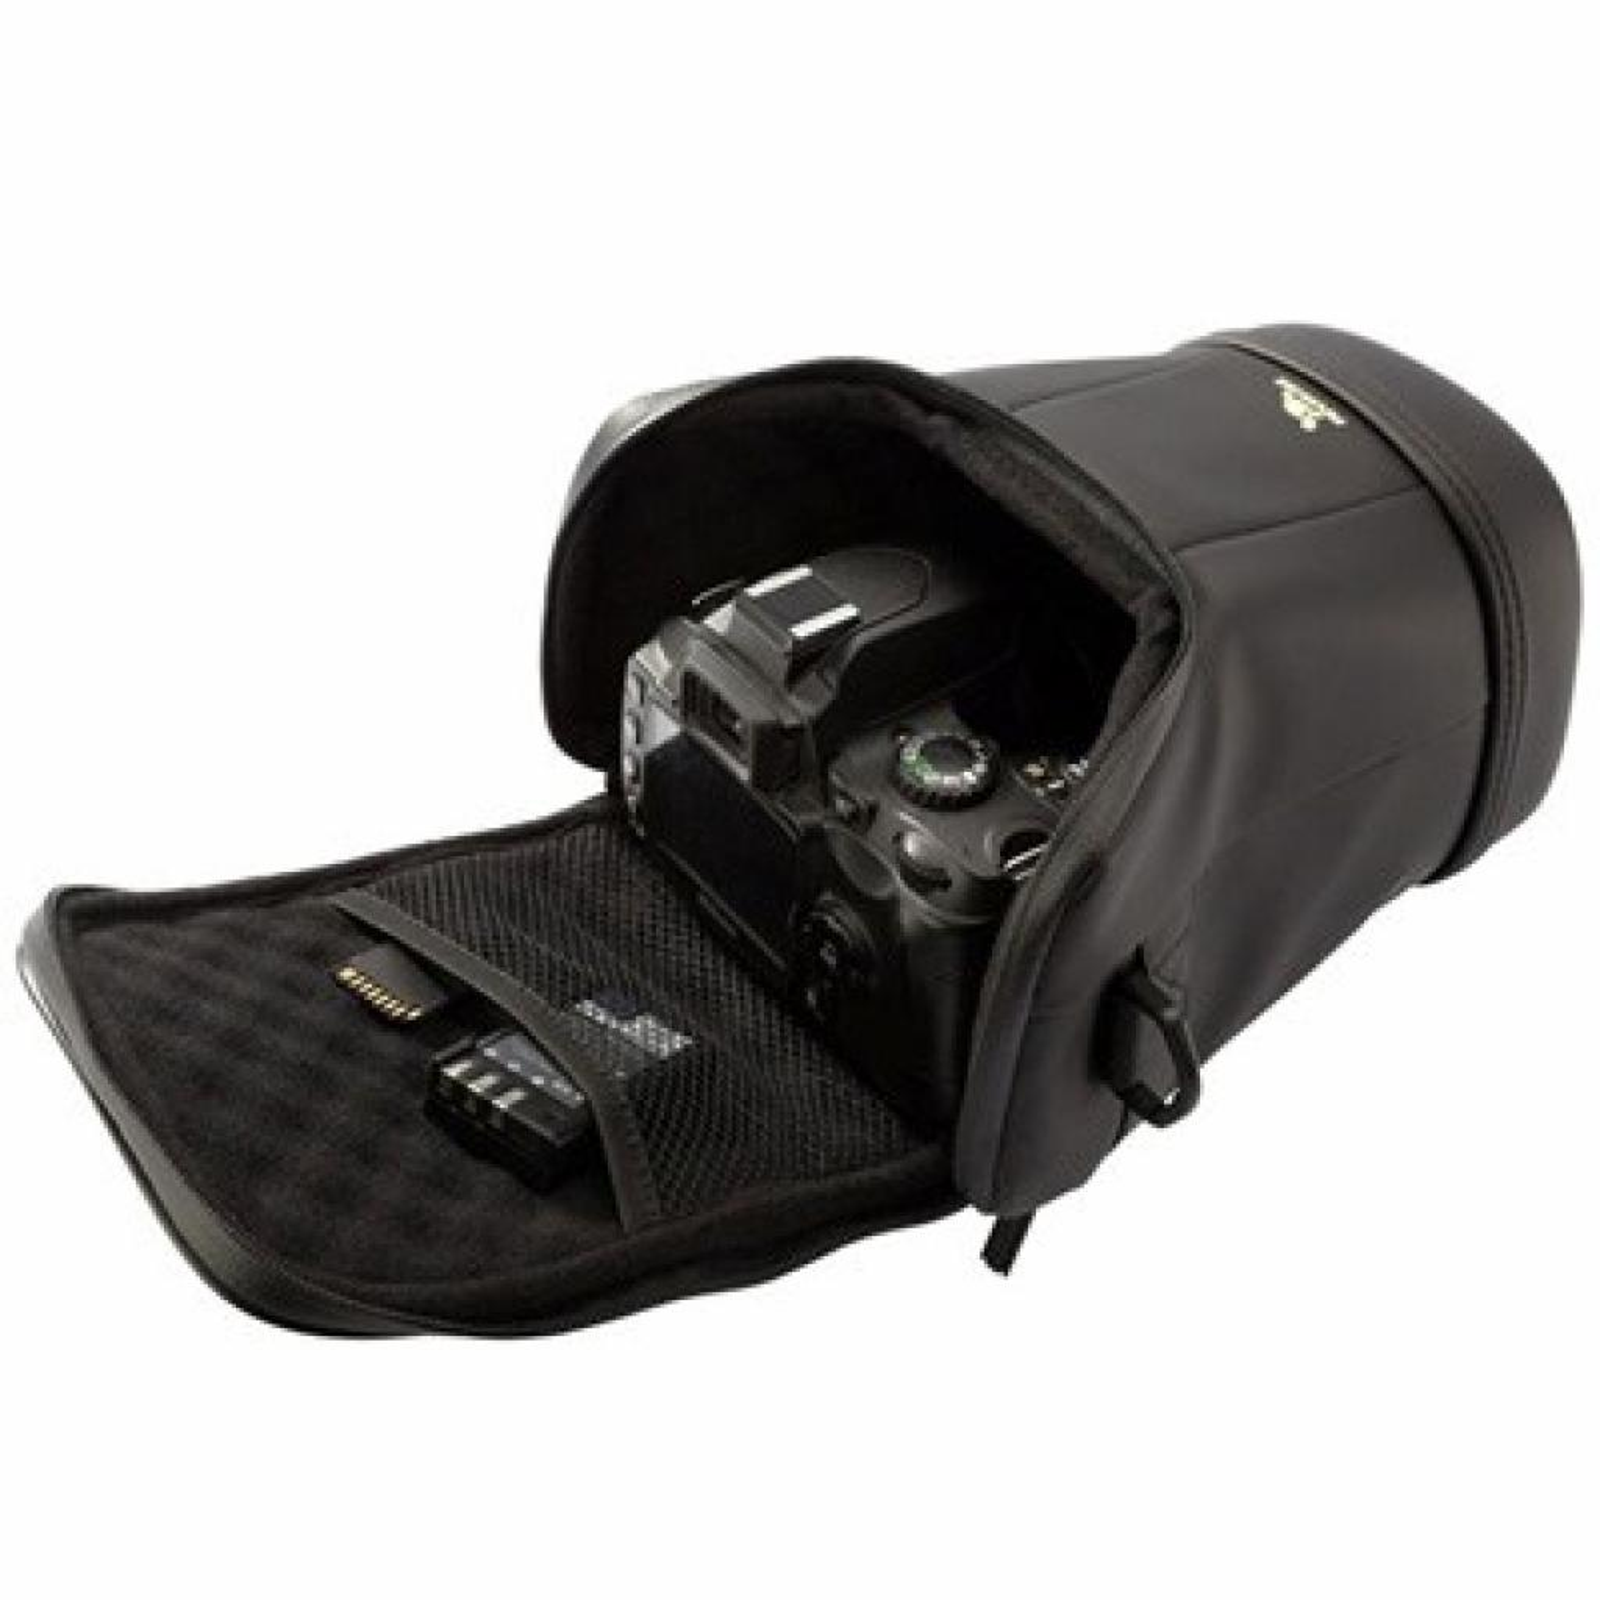 Фото-сумка RivaCase Antishock SLR Case (1512LRPU Black) изображение 2